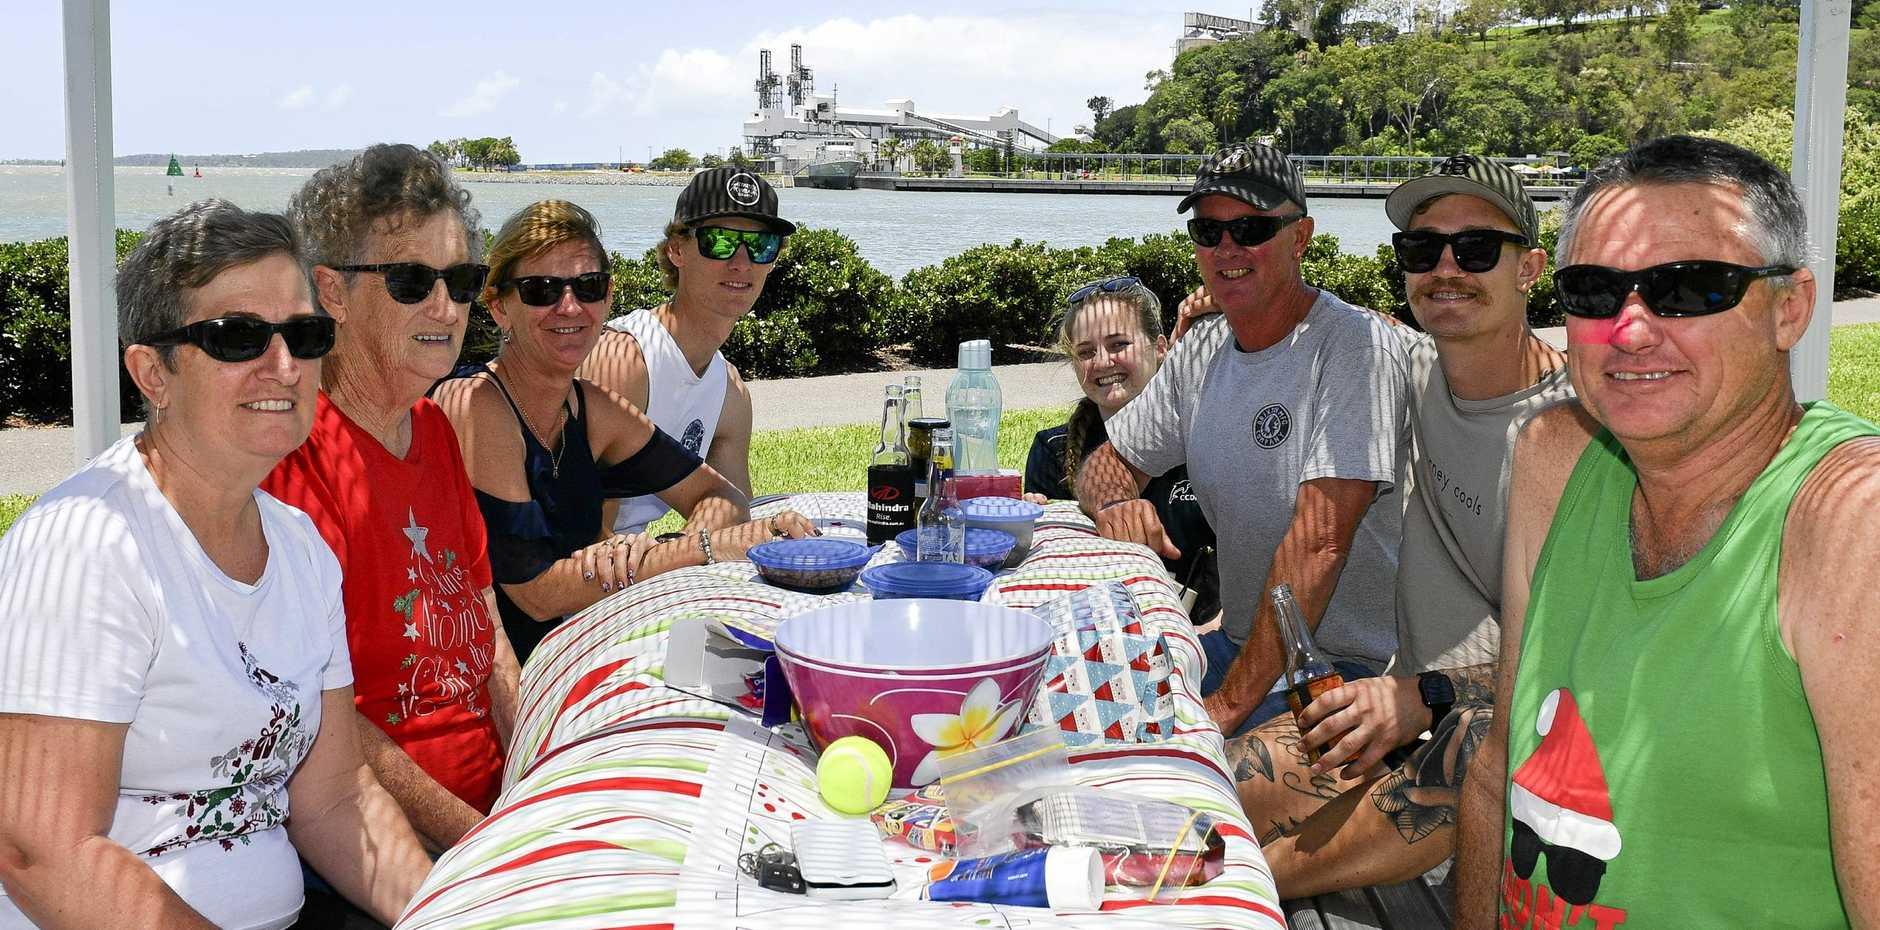 The Dahl family at the marina. Michelle, Barb, Michelle, Btody, Mel, Graeme, Rhys and Gary.